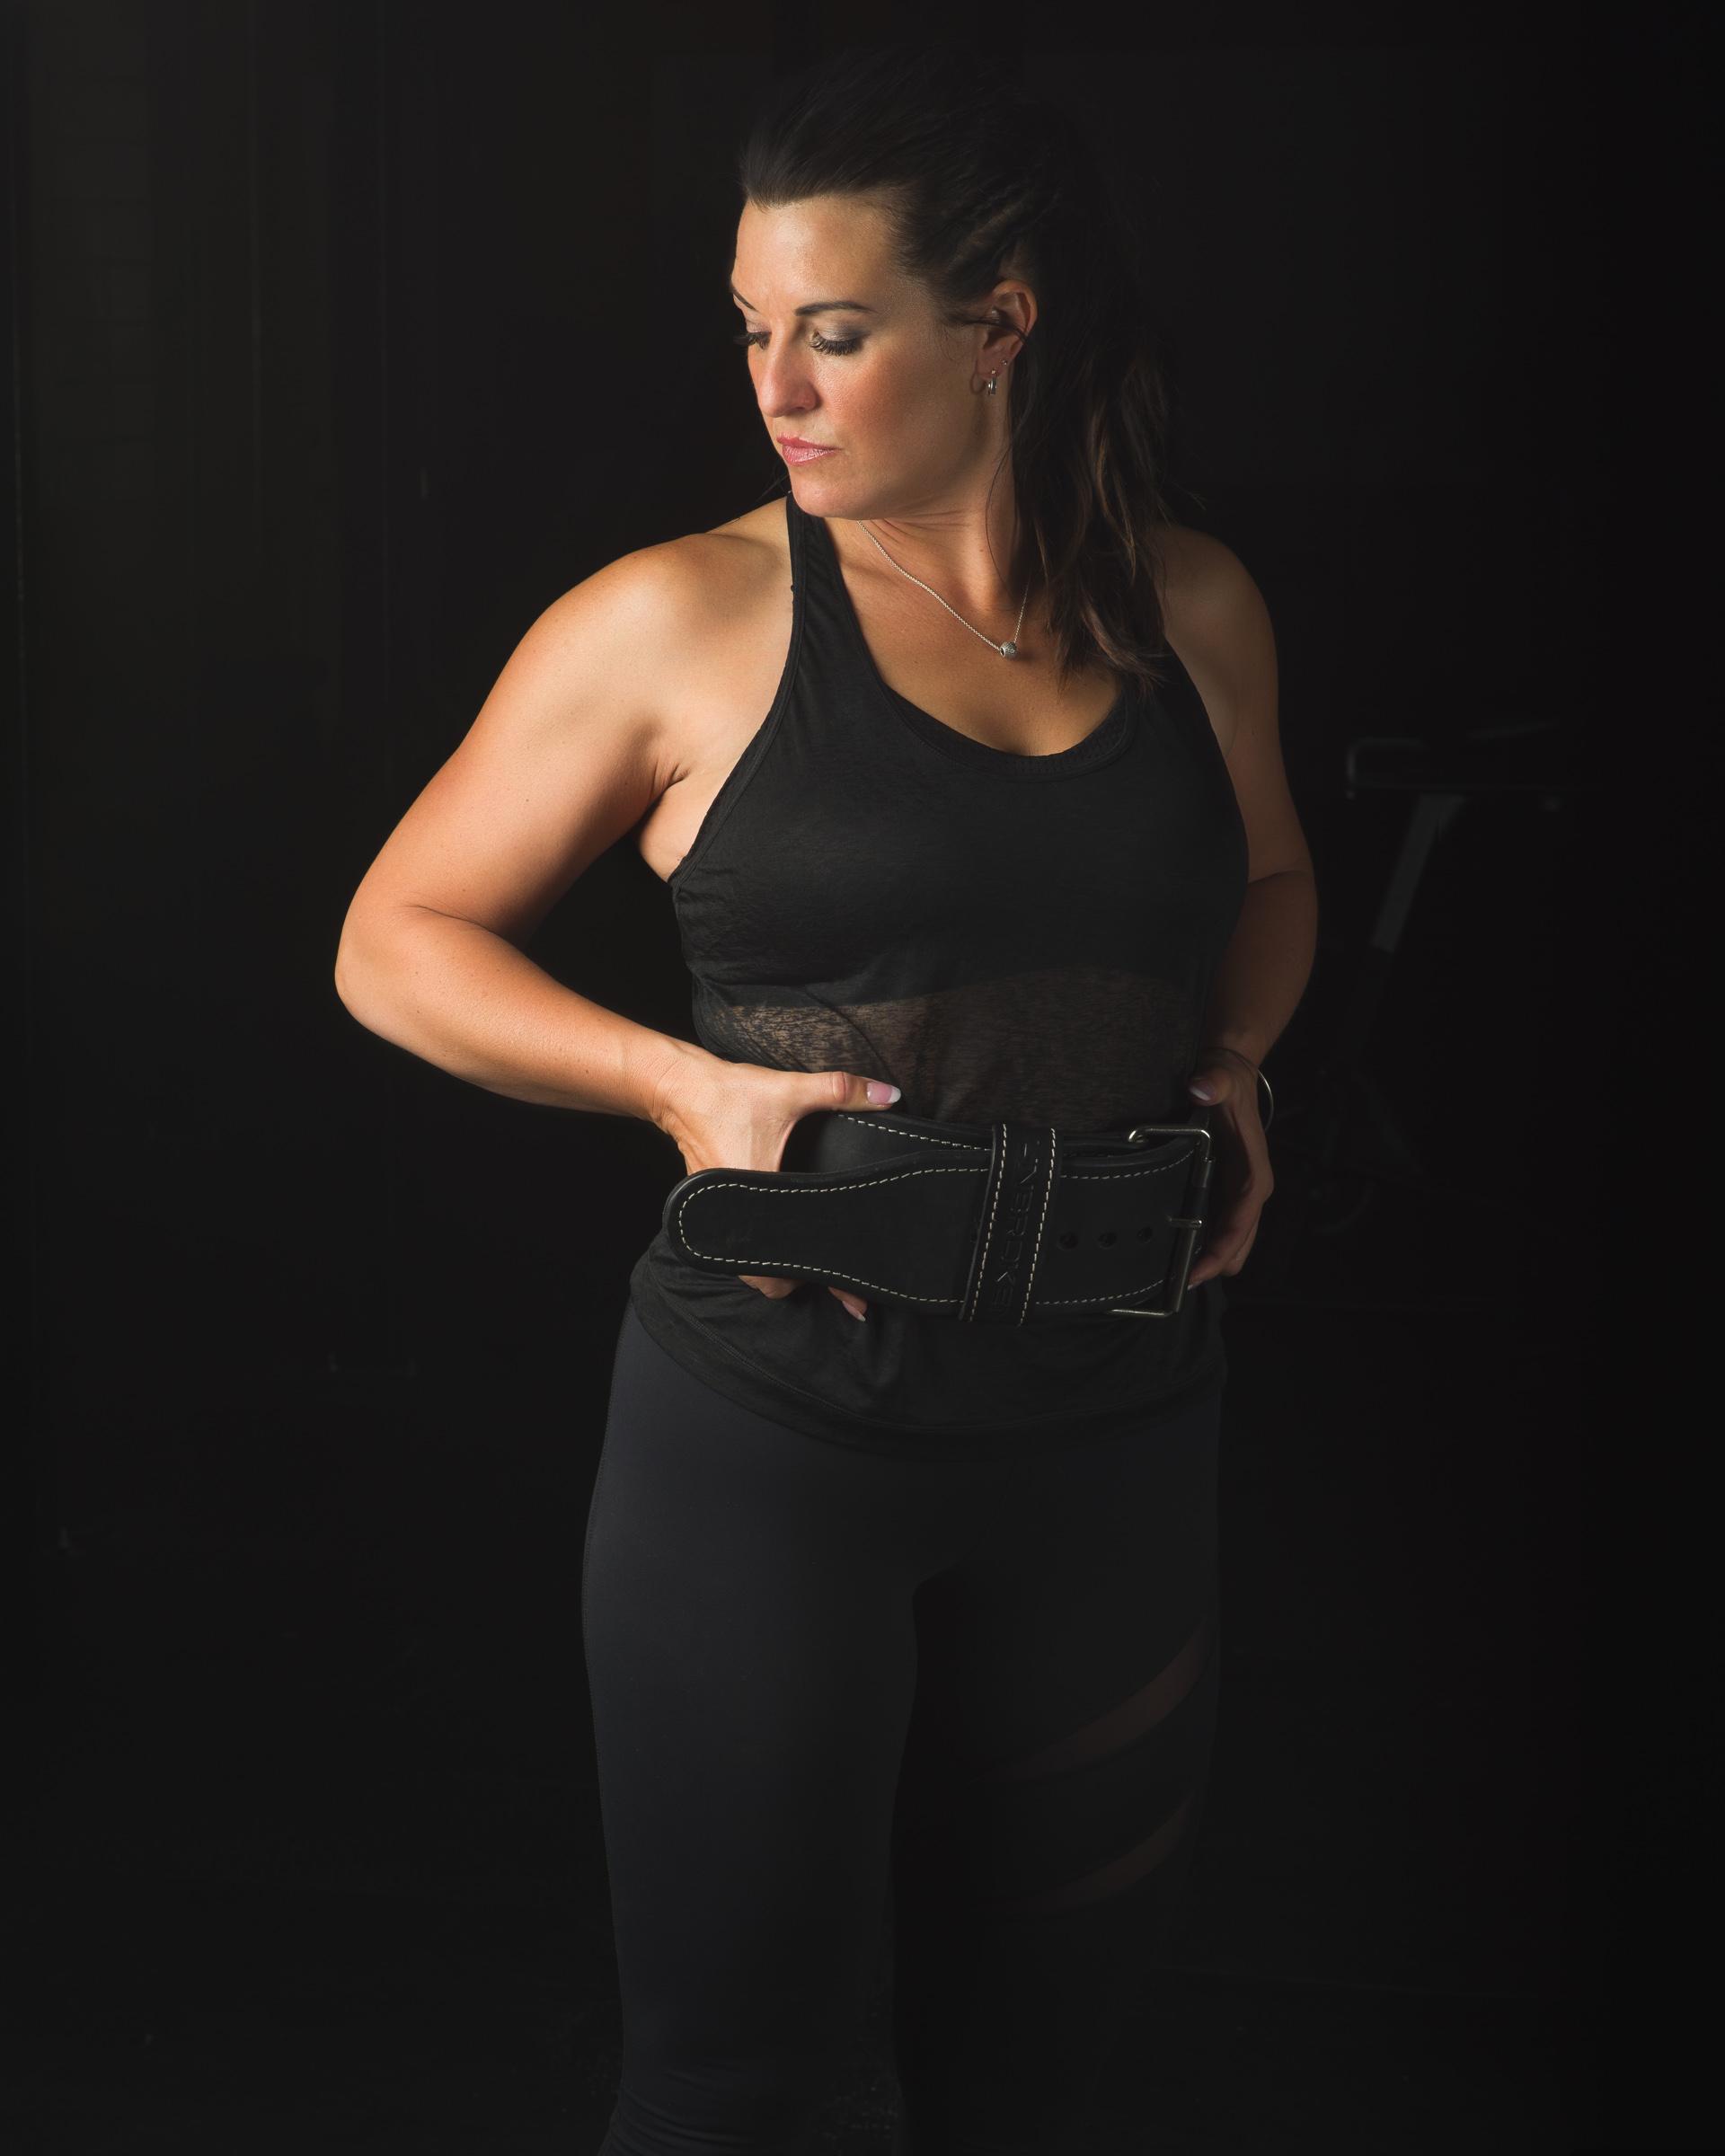 Studio Fitness Portrait Photography by Kyle Green. Aylmer, London, St. Thomas, Tillsonburg.